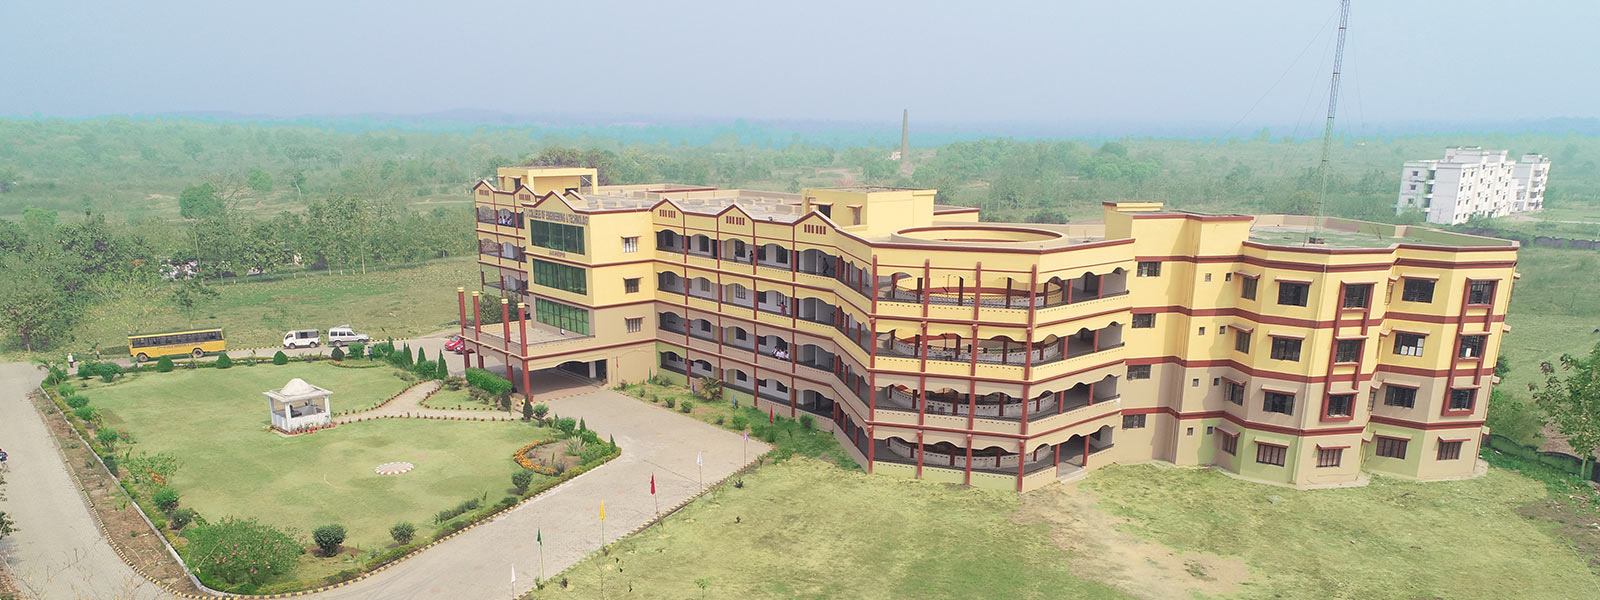 B.A. College Of Engineering, Jamshedpur